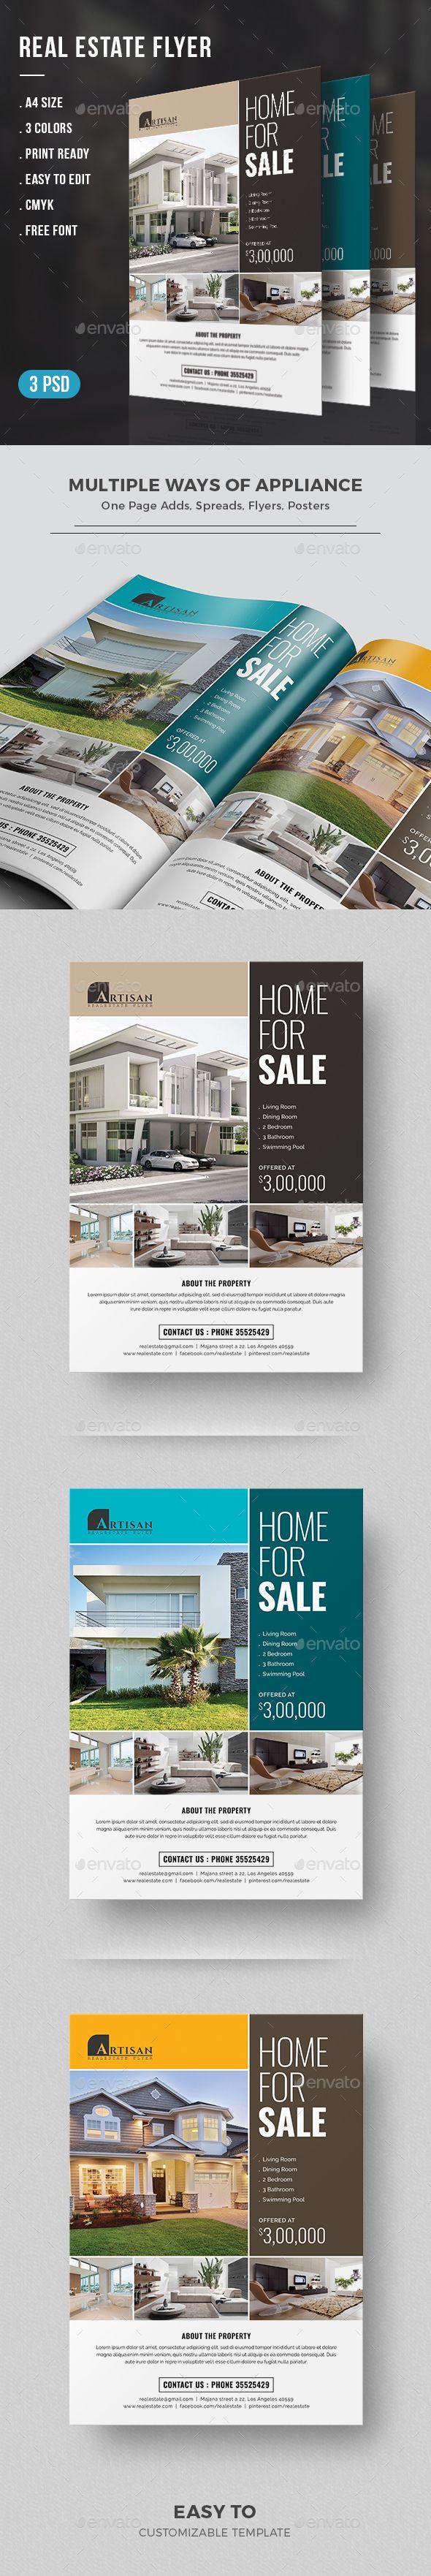 Real Estate Flyer Template PSD. Download here: https://graphicriver.net/item/real-estate-flyer/17364520?ref=ksioks